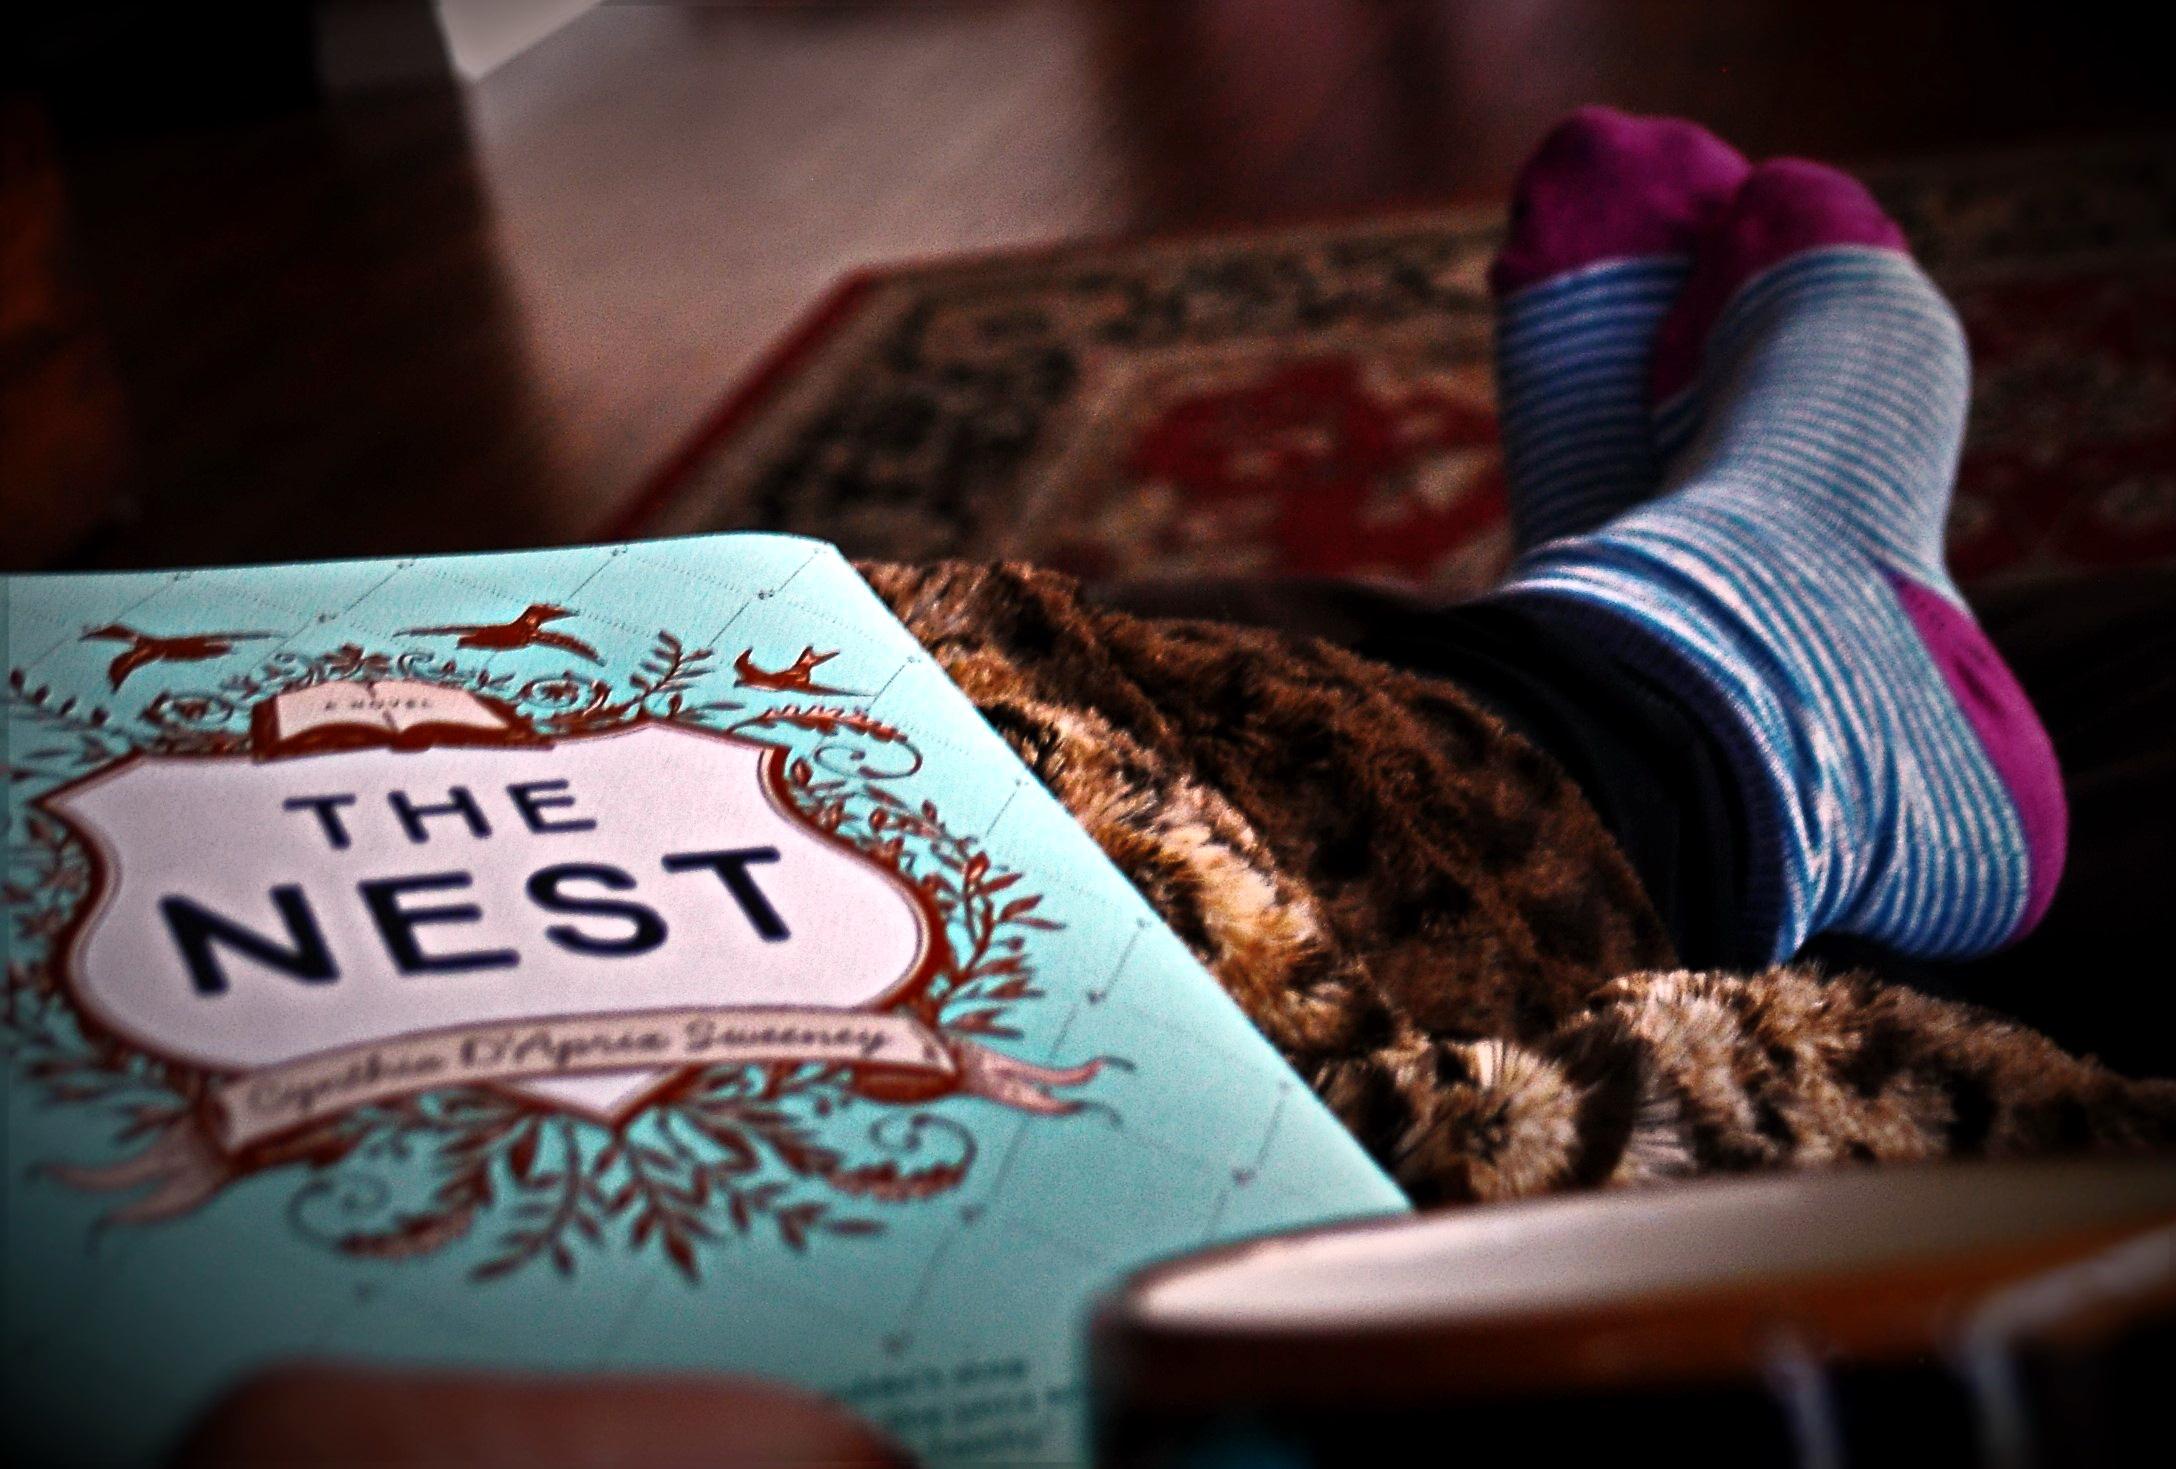 Cozy Reader Club April 2016 Relax